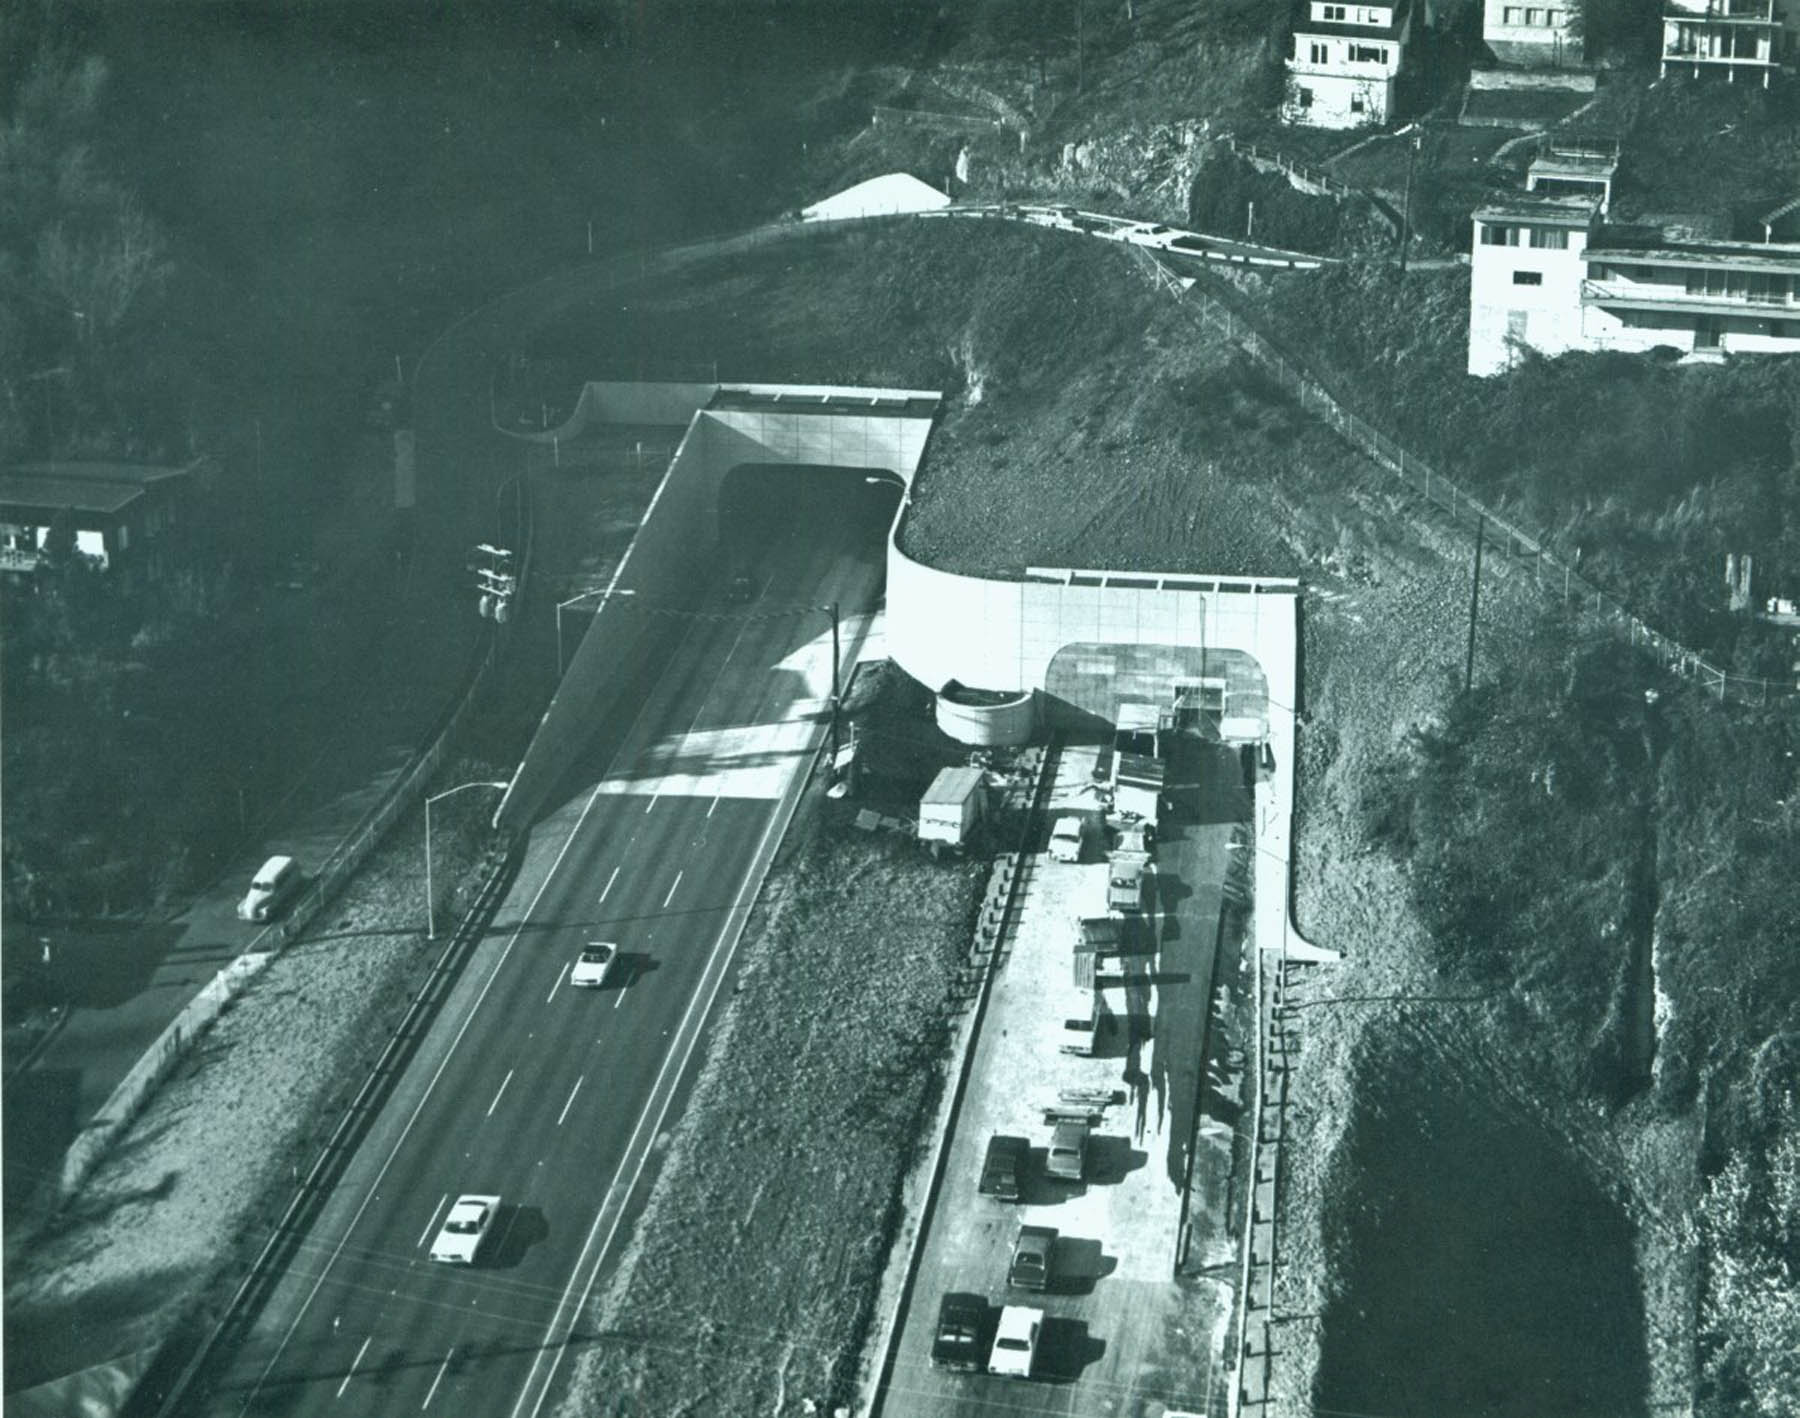 A2004-001.1059  Vista tunnel under construction 1969